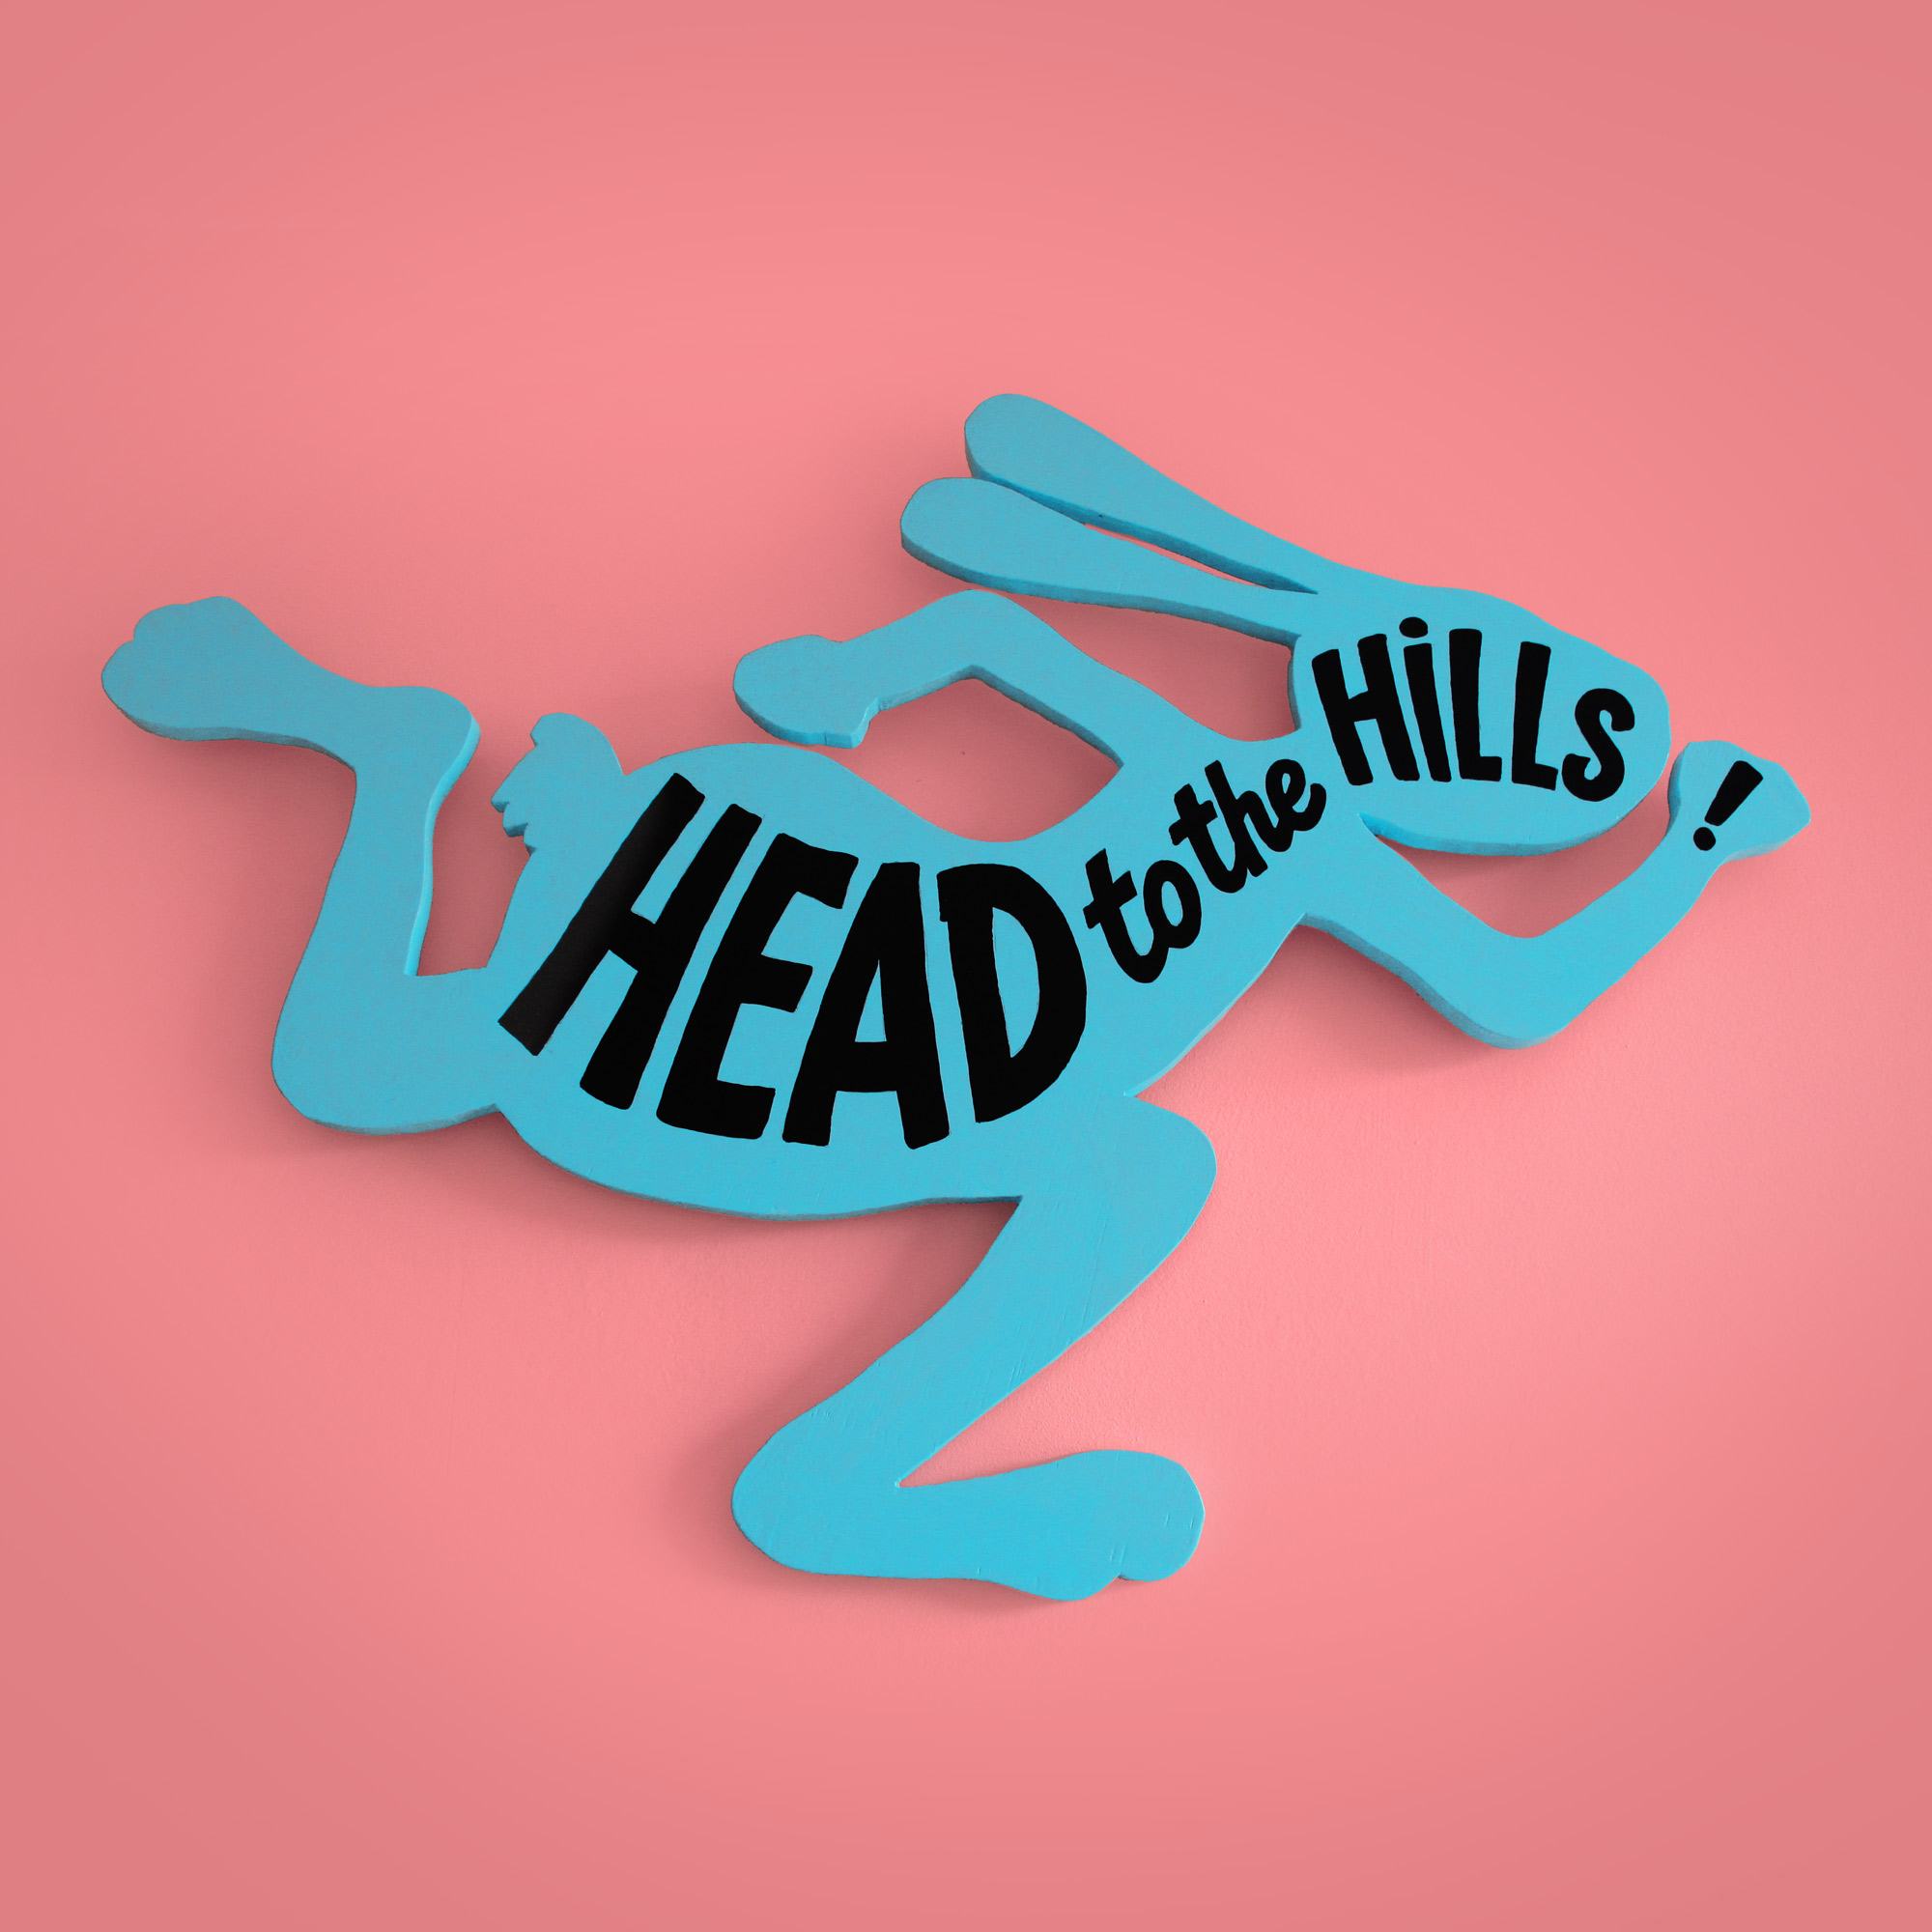 headtothehills.jpg